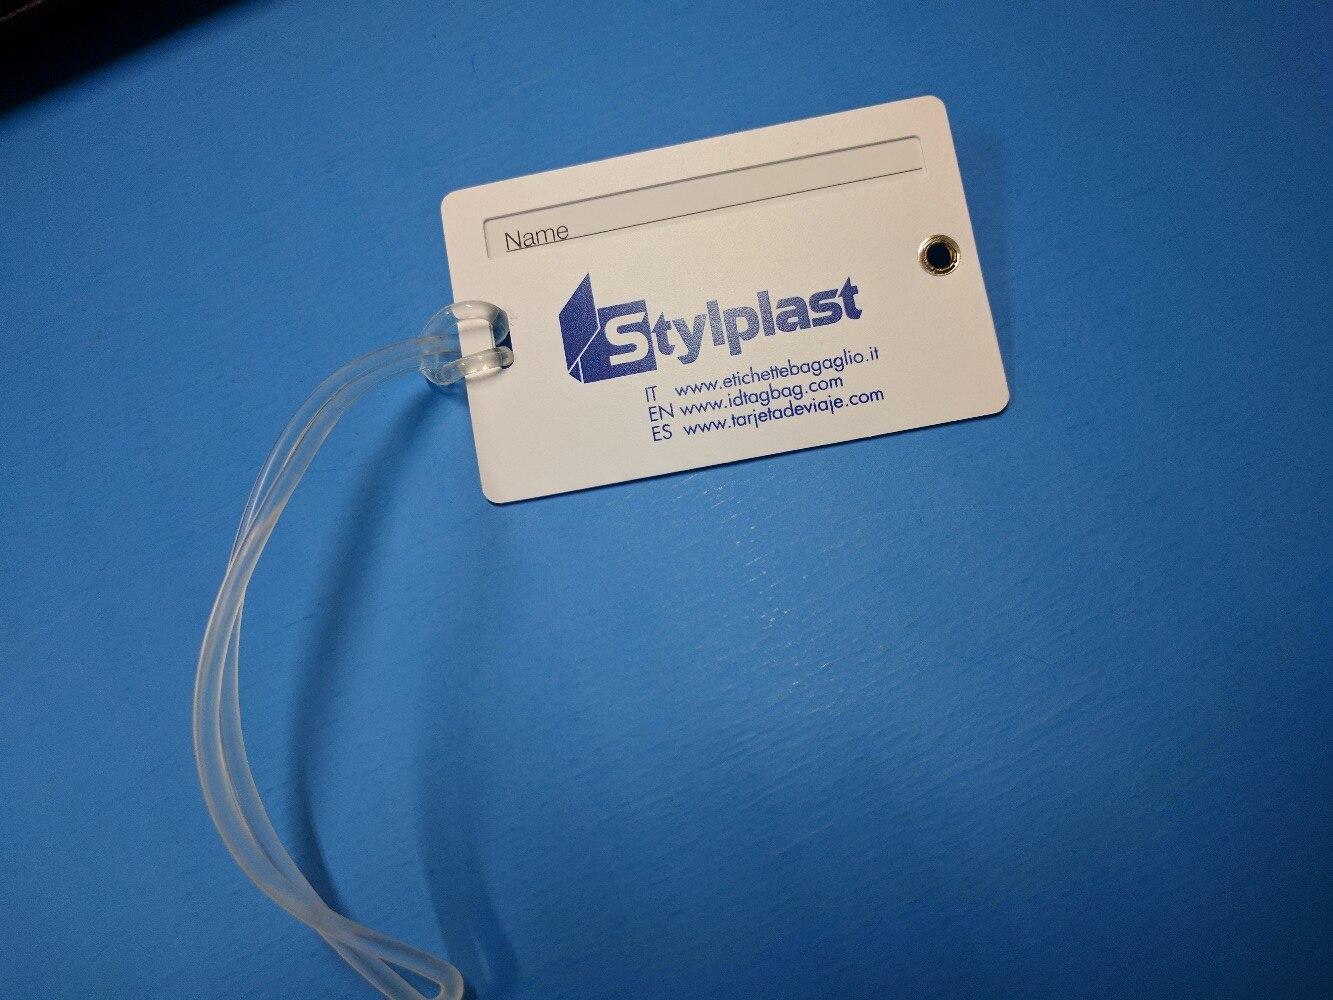 plastic luggage tag/plastic travel tag samples for sending